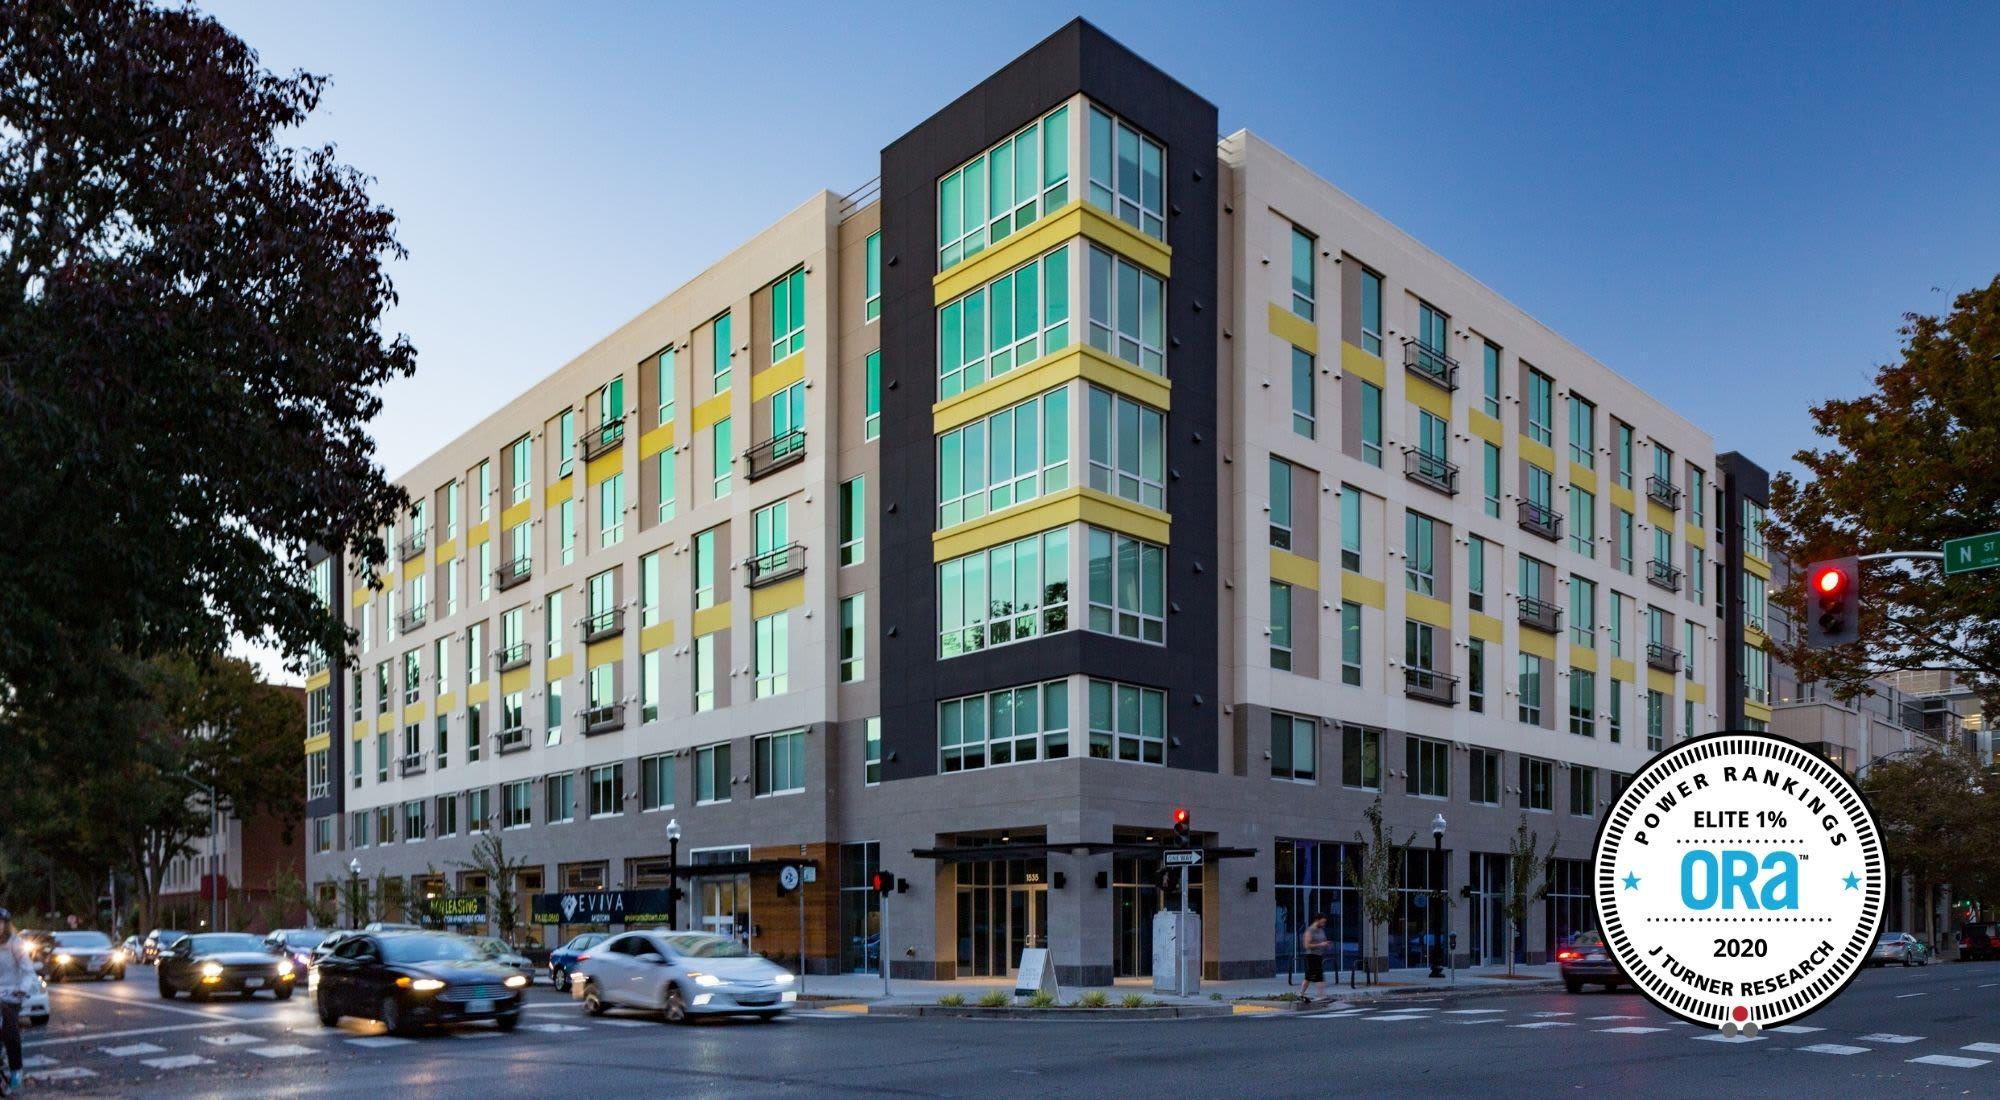 Apartments at EVIVA Midtown in Sacramento, California